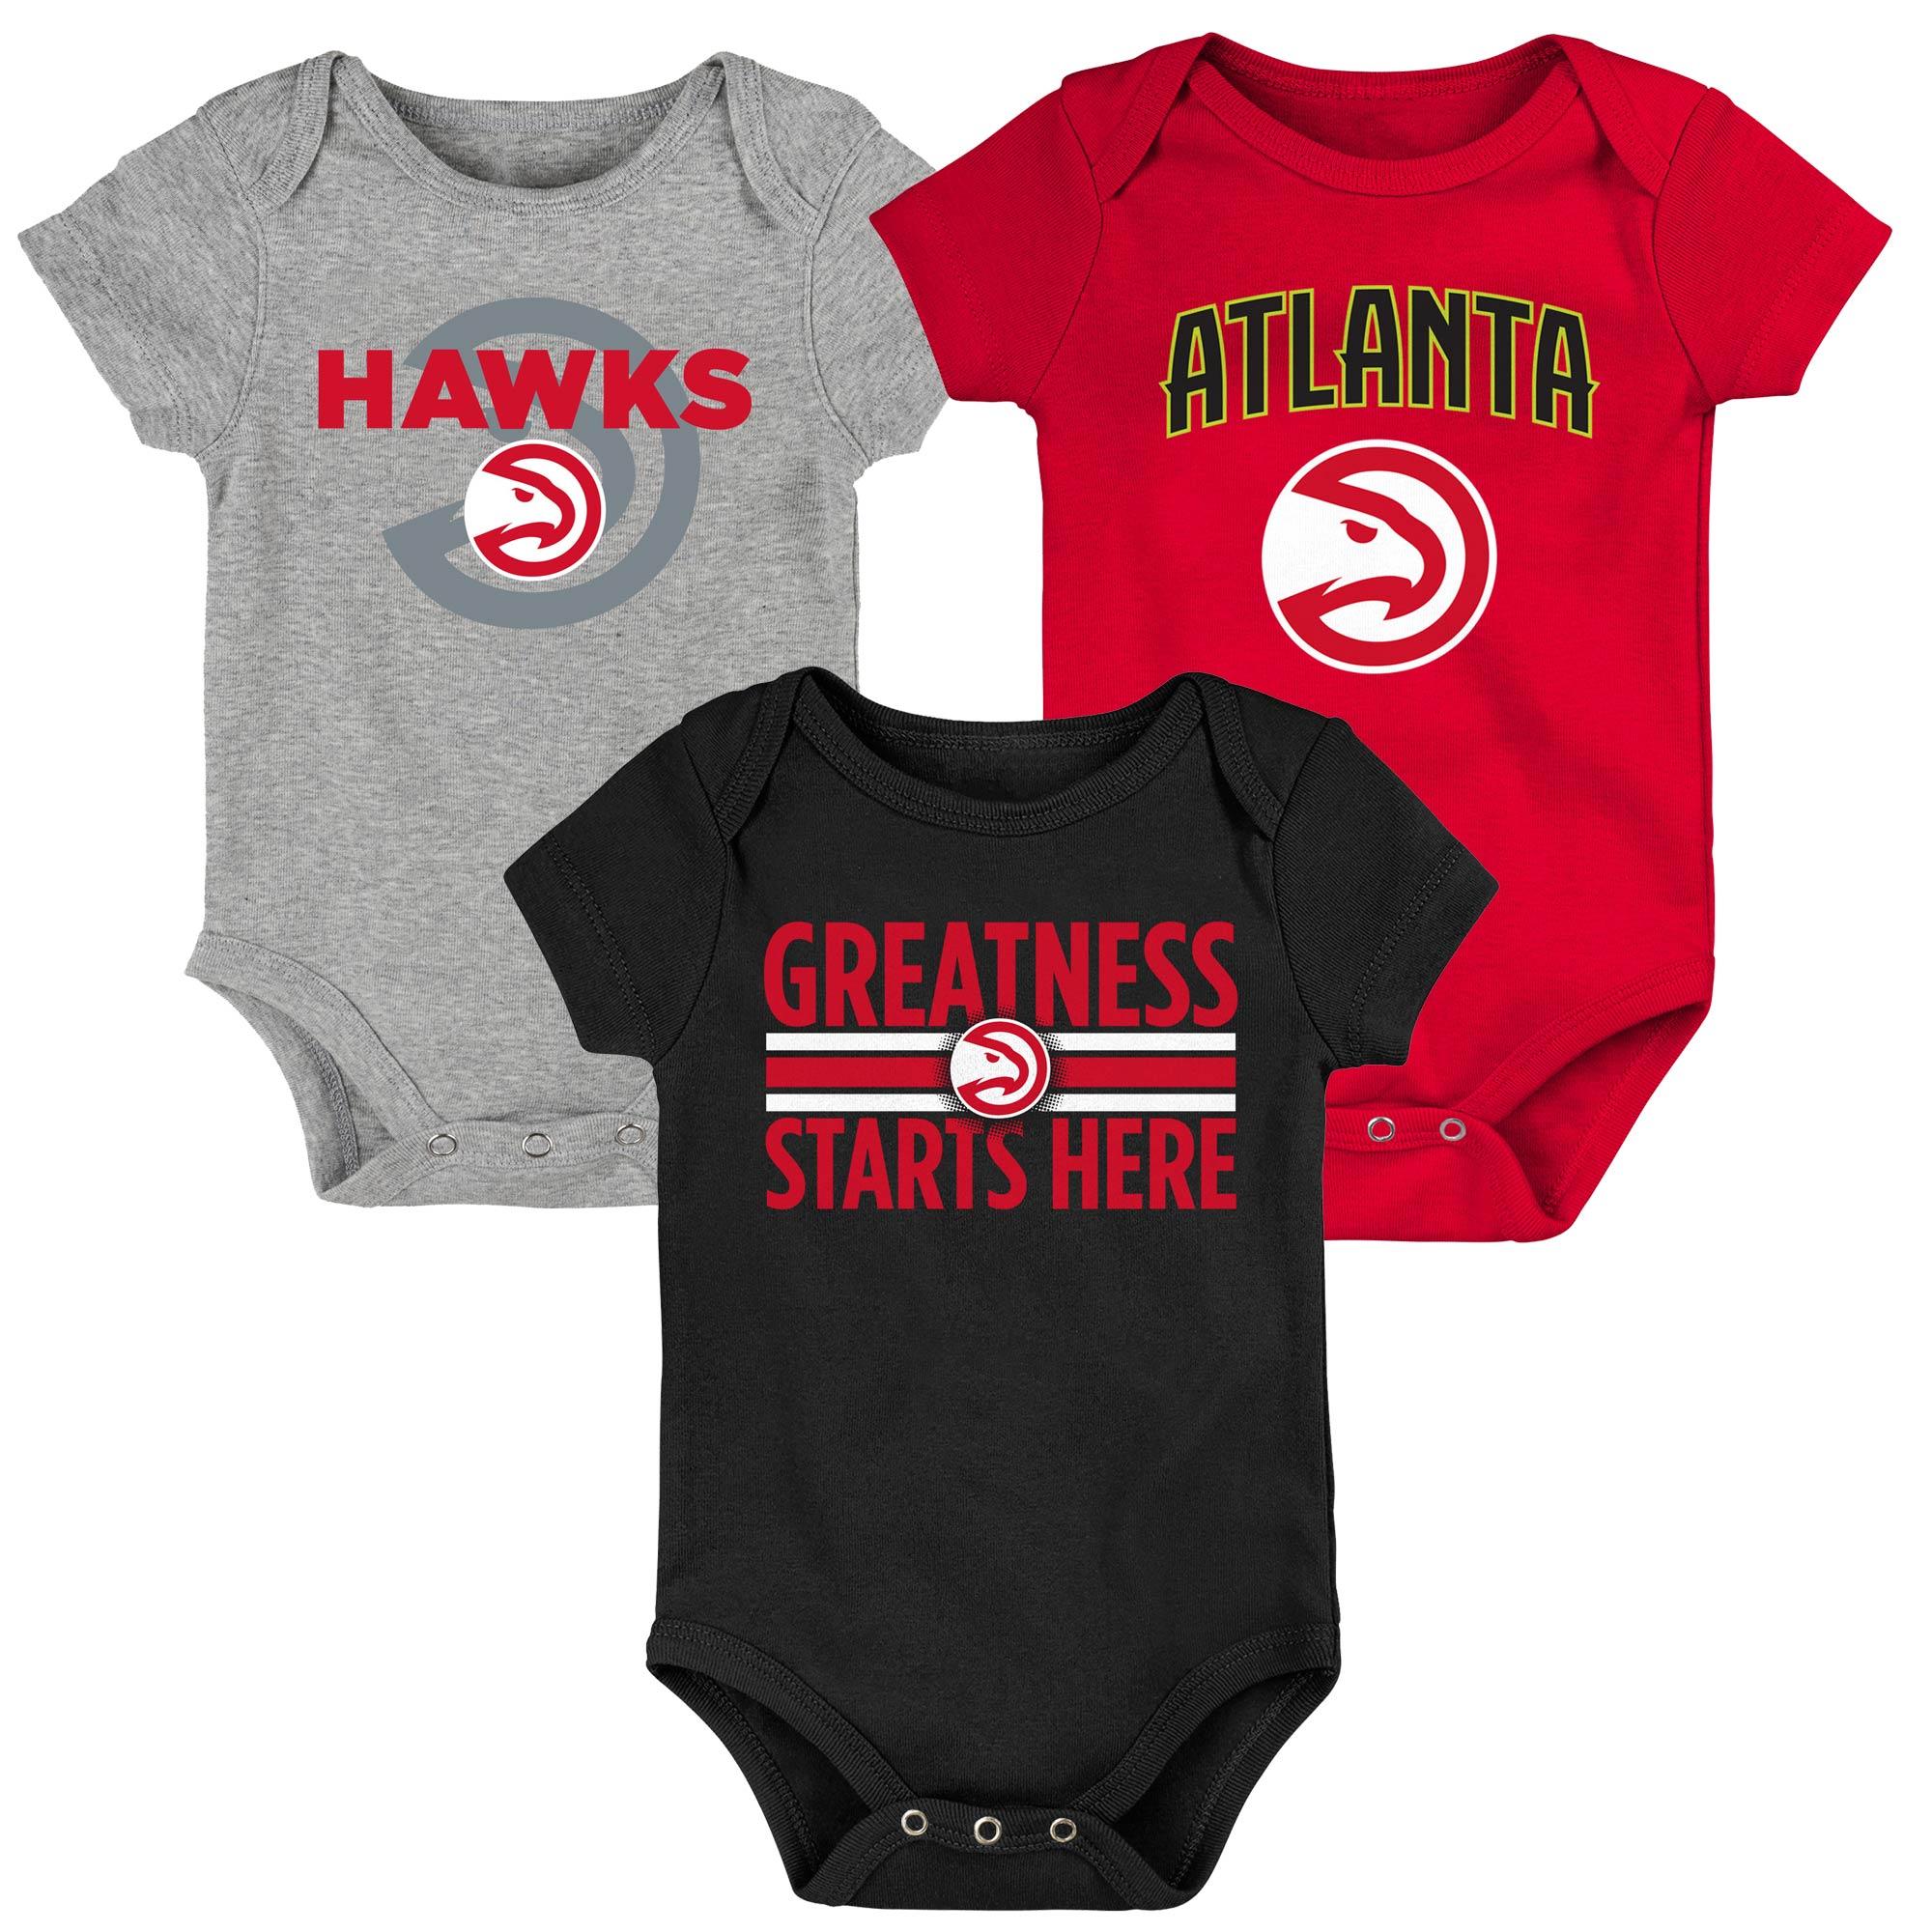 Atlanta Hawks Newborn & Infant Three-Pack Bodysuit Set - Red/Black/Gray